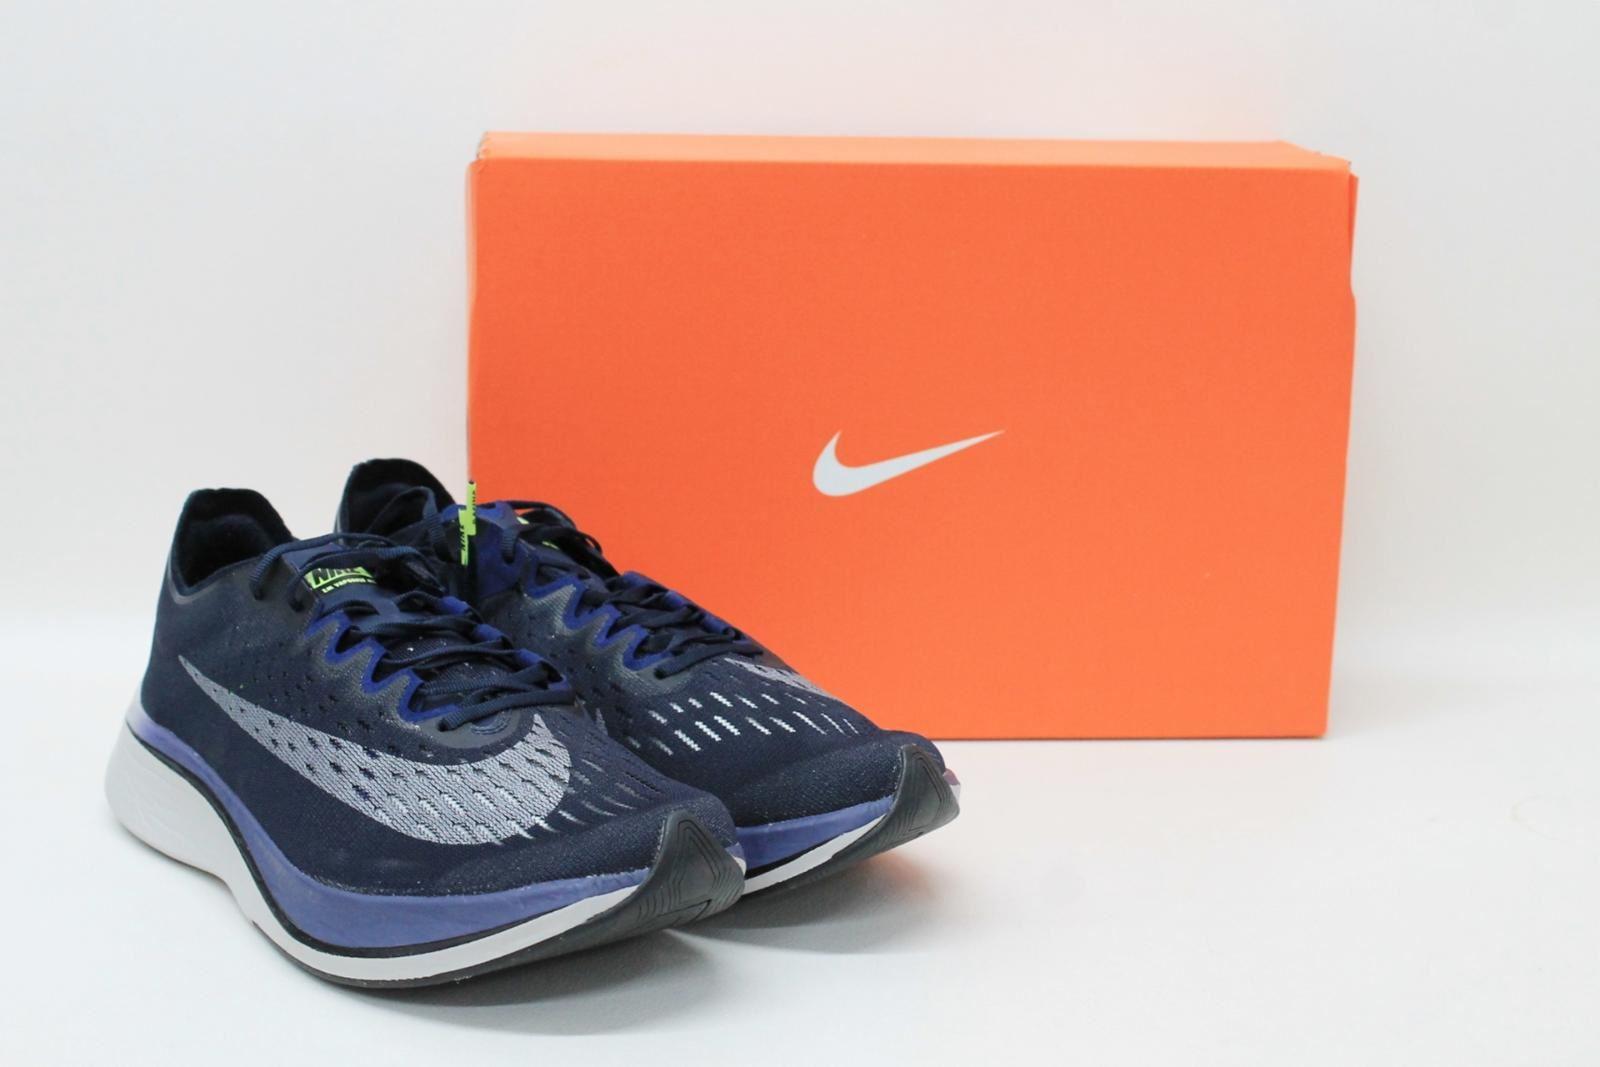 990b7c08 BNIB NIKE Zoom Vaporfly Men's Navy bluee Grey Trainers shoes Size UK10 EU44  nonlhn1239-Athletic Shoes